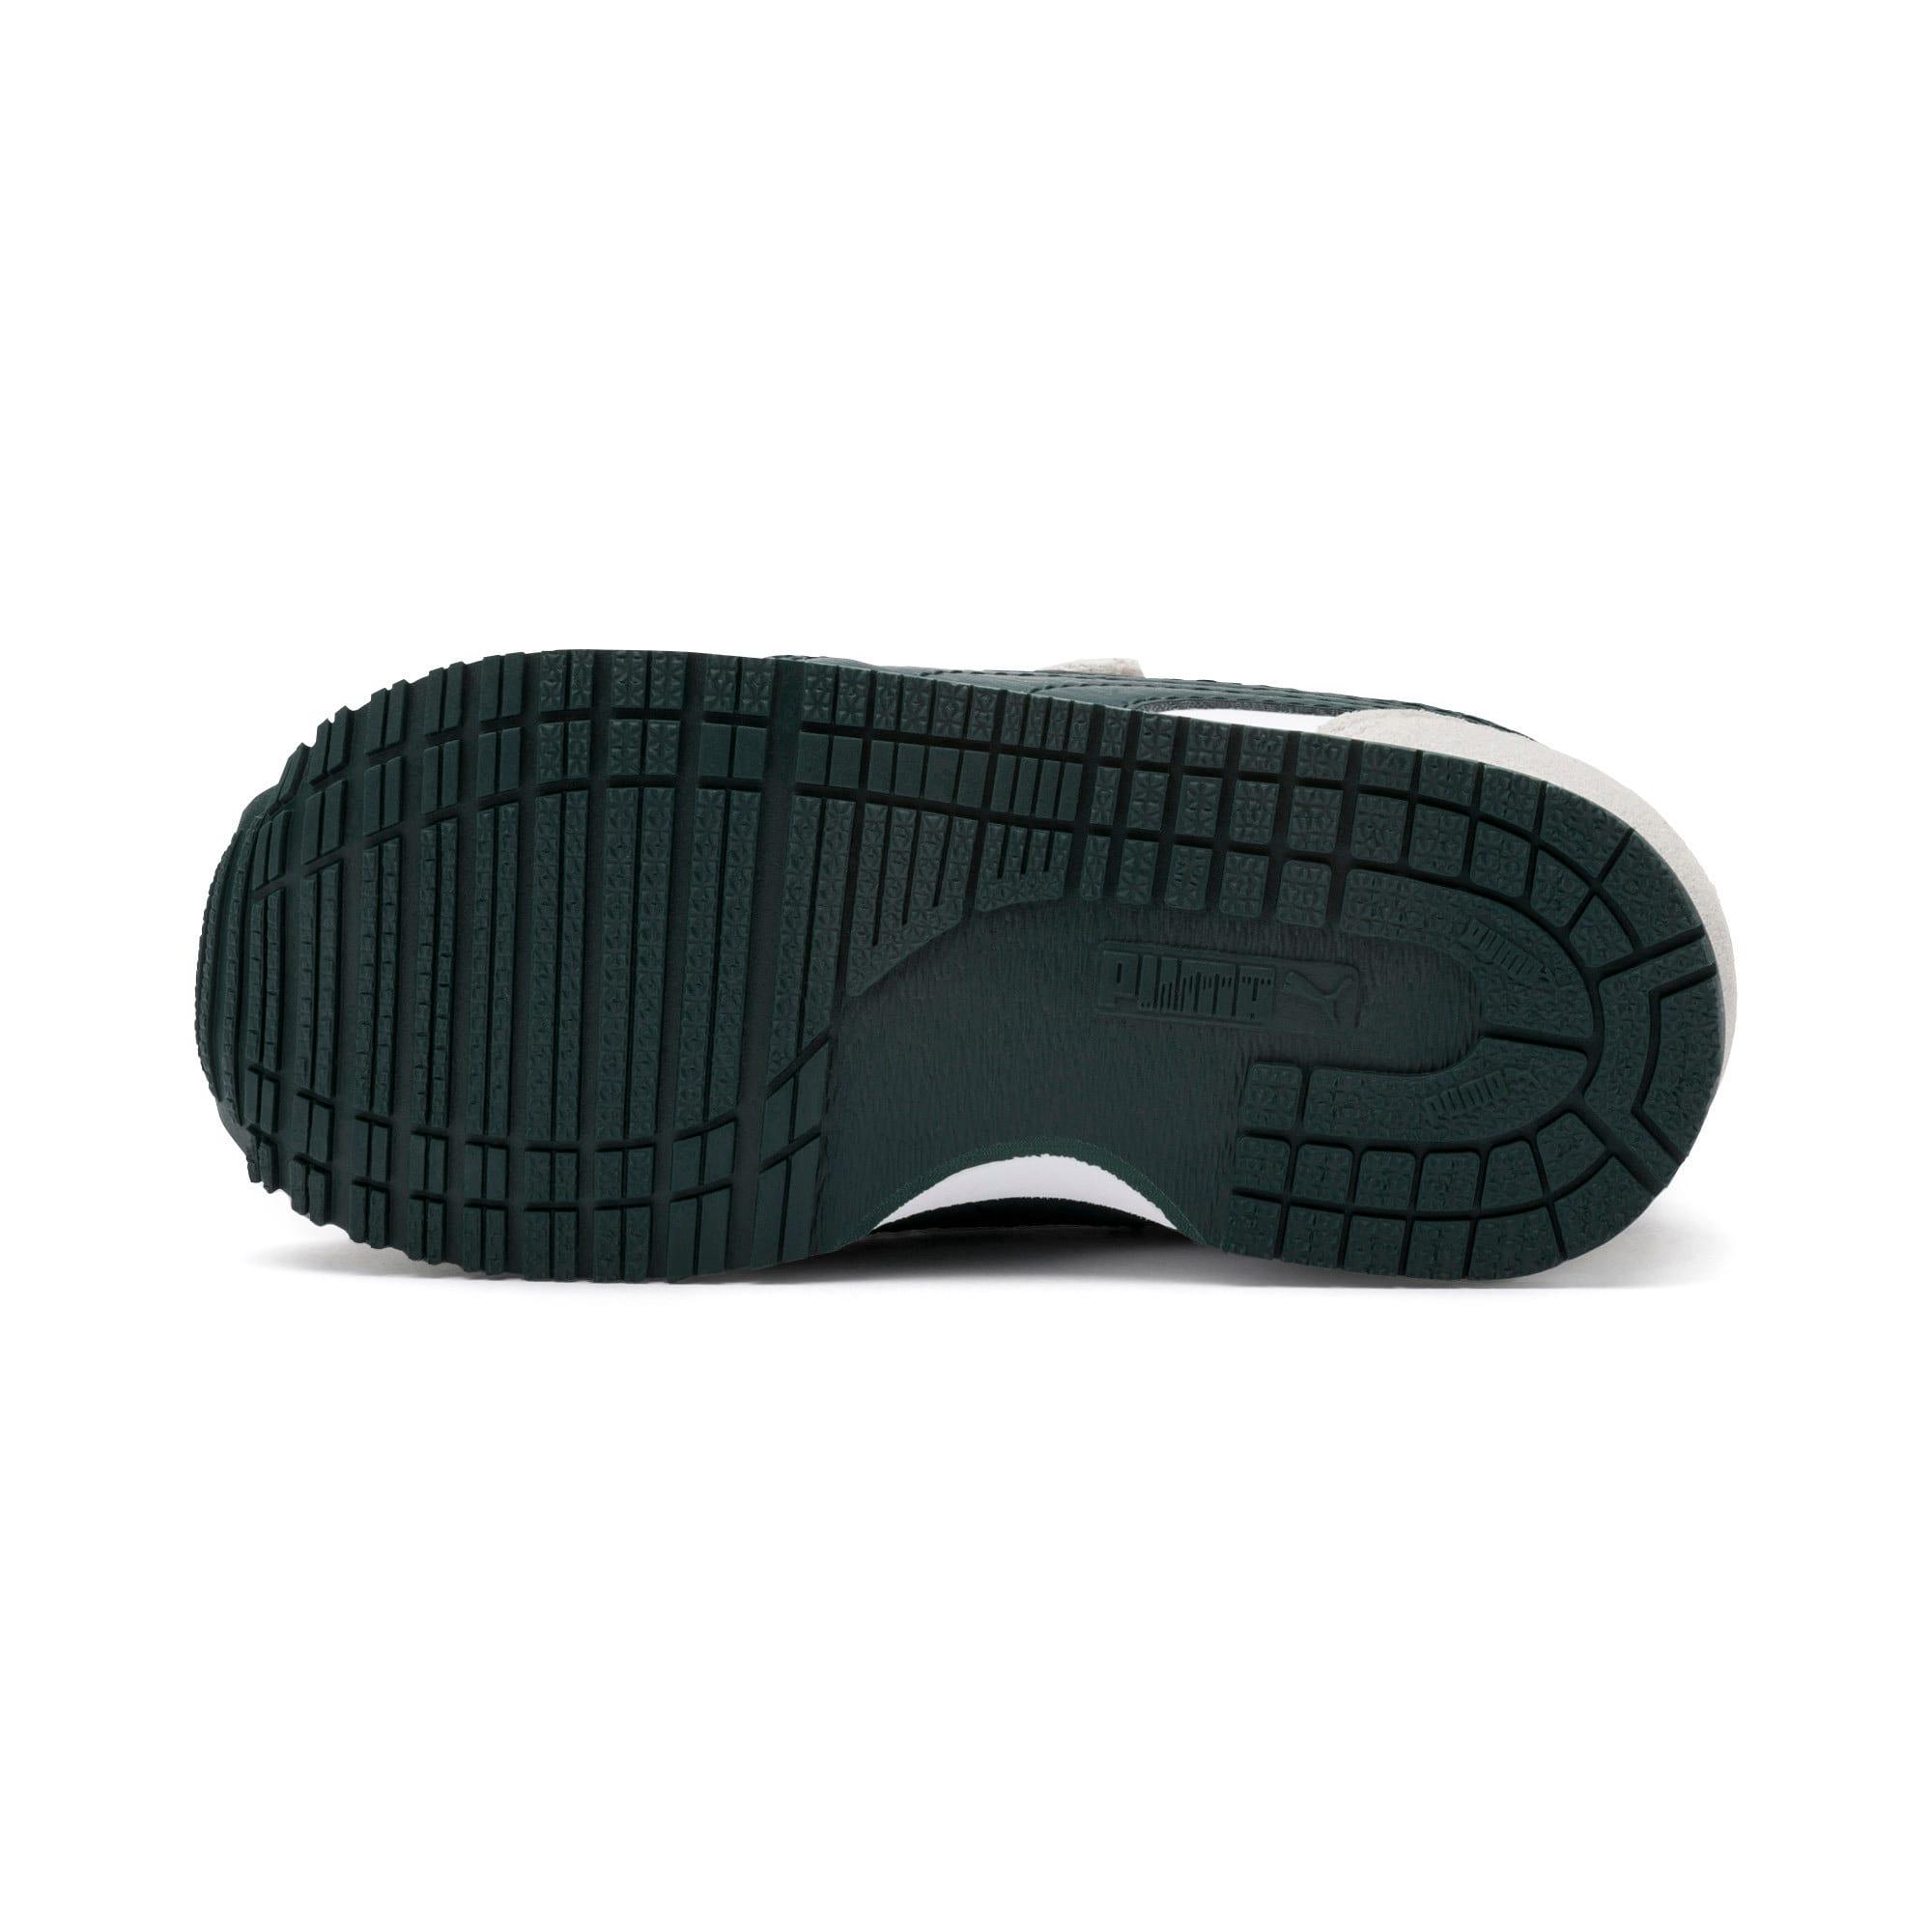 Thumbnail 4 of Cabana Racer SL Toddler Shoes, Puma White-Gray Violet, medium